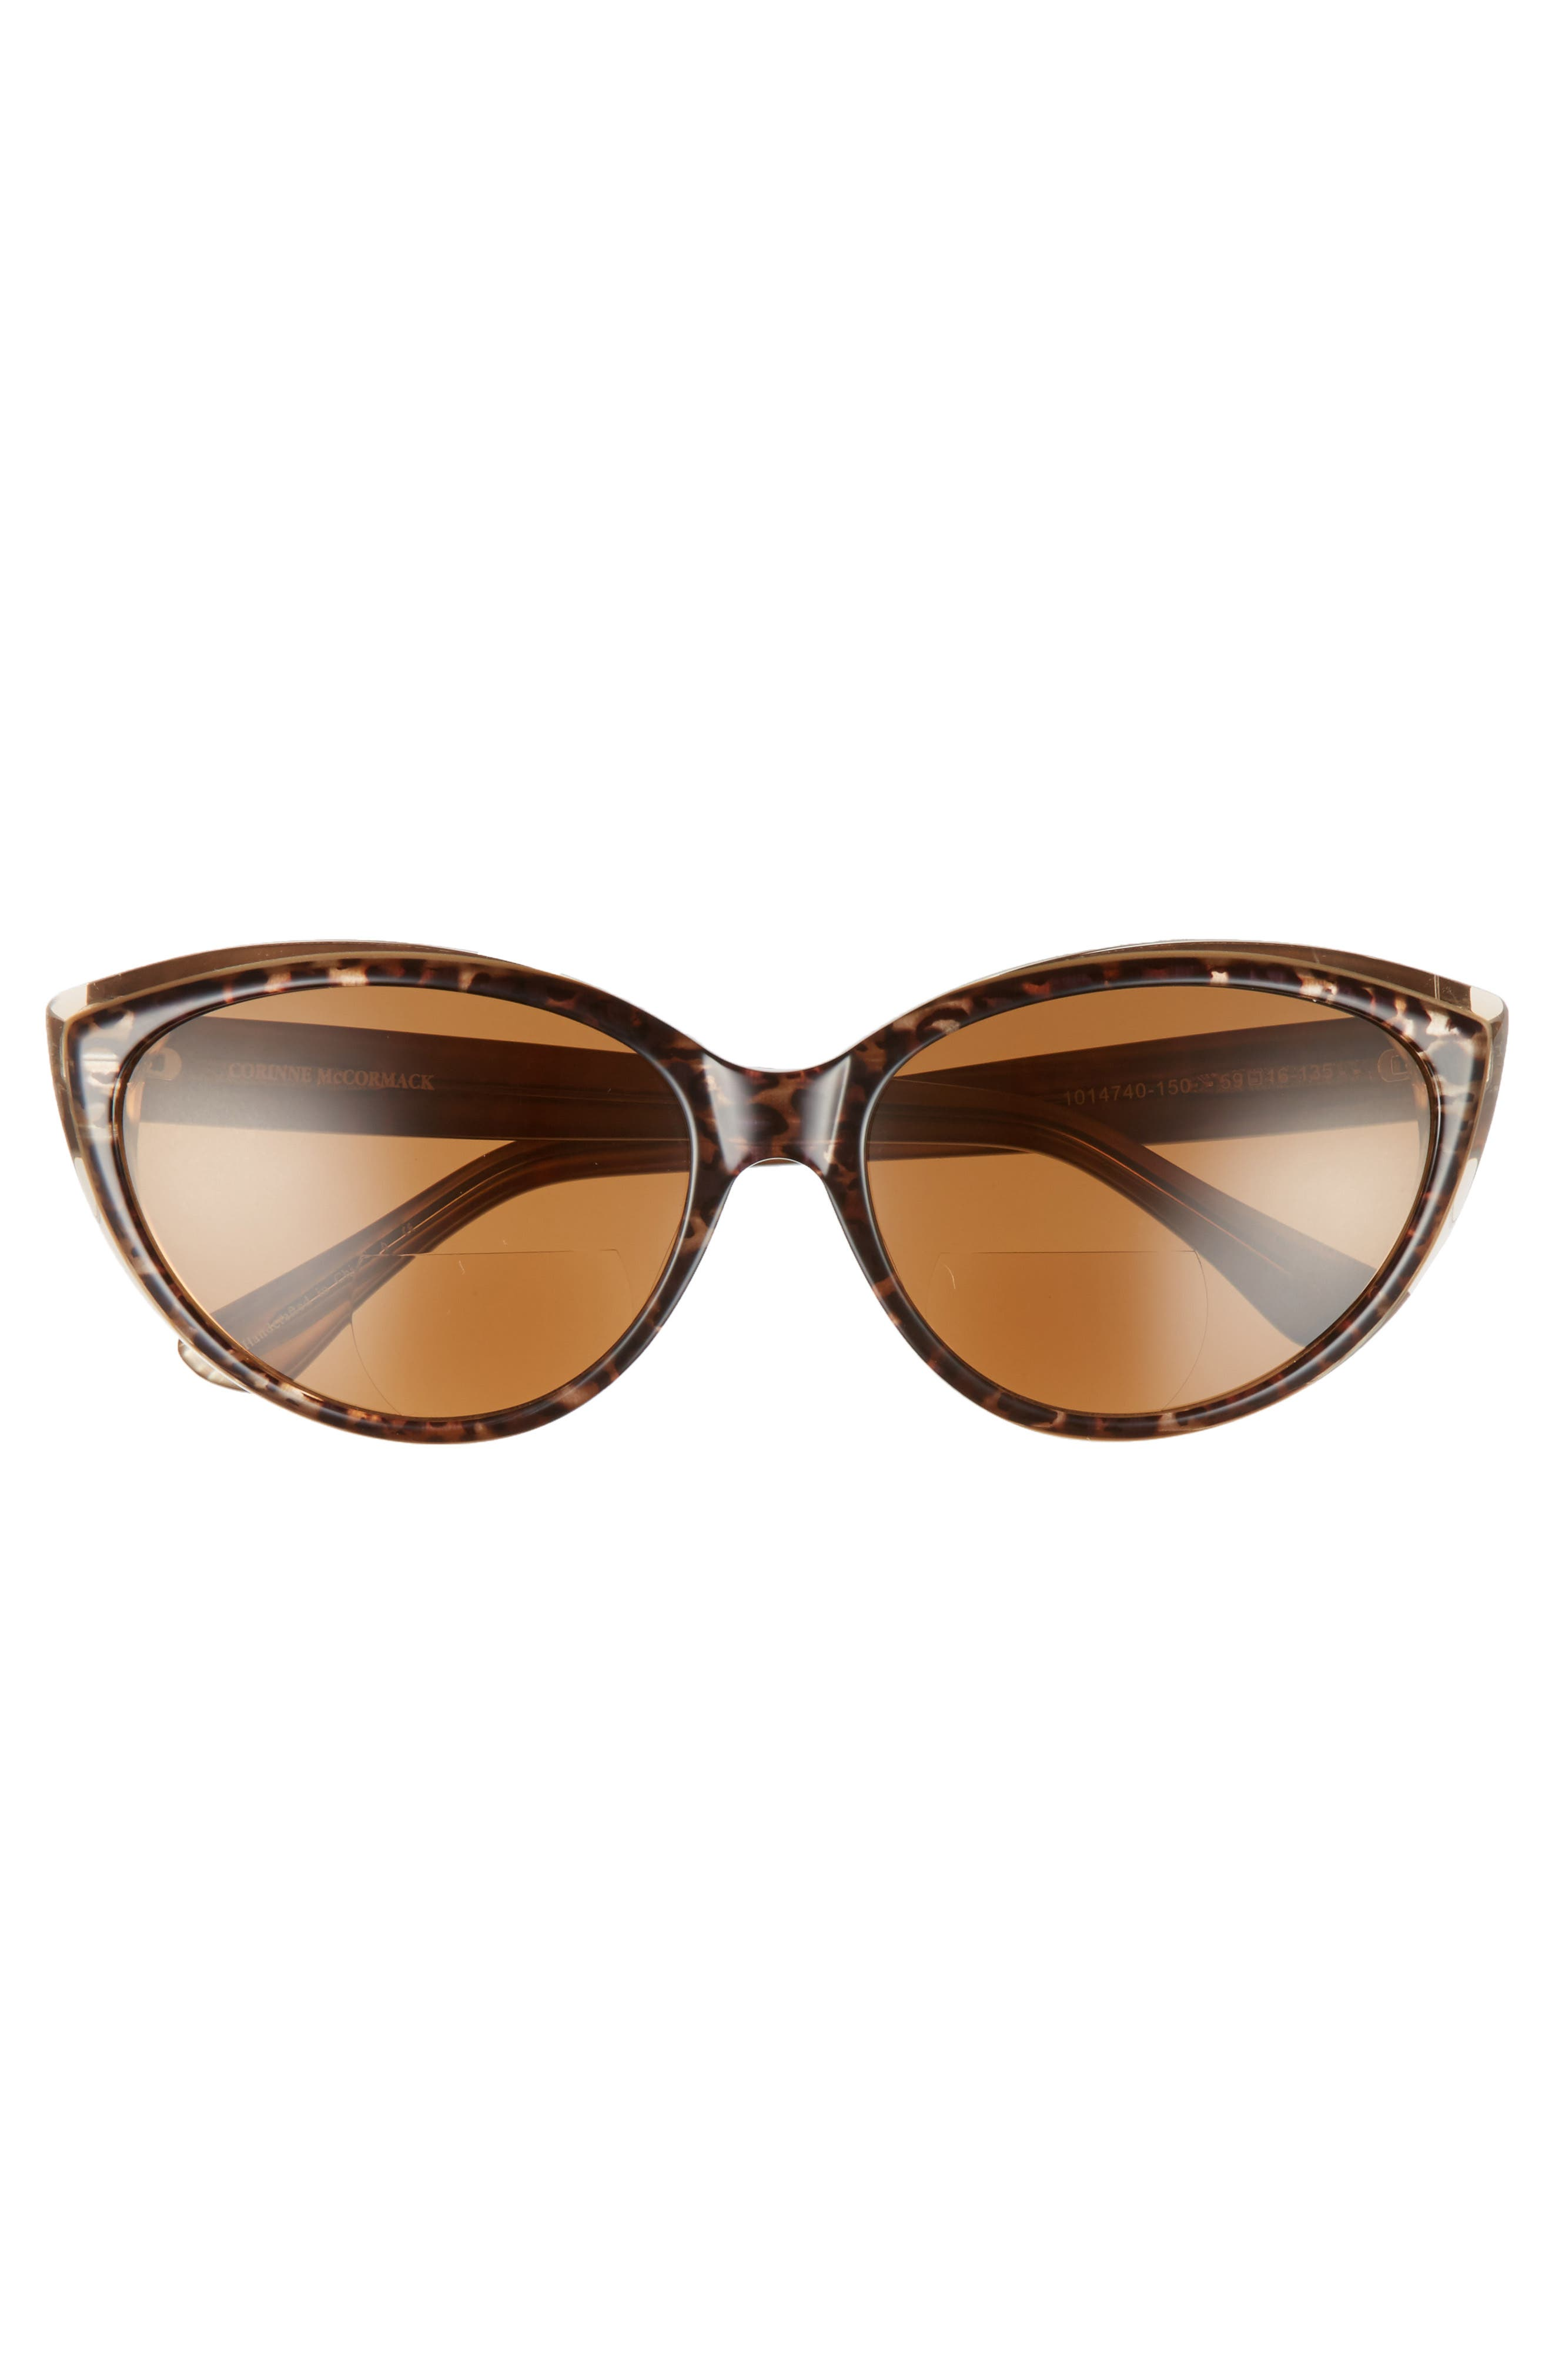 Corrine McCormack Anita 59mm Reading Sunglasses,                             Alternate thumbnail 3, color,                             DARK LEOPARD